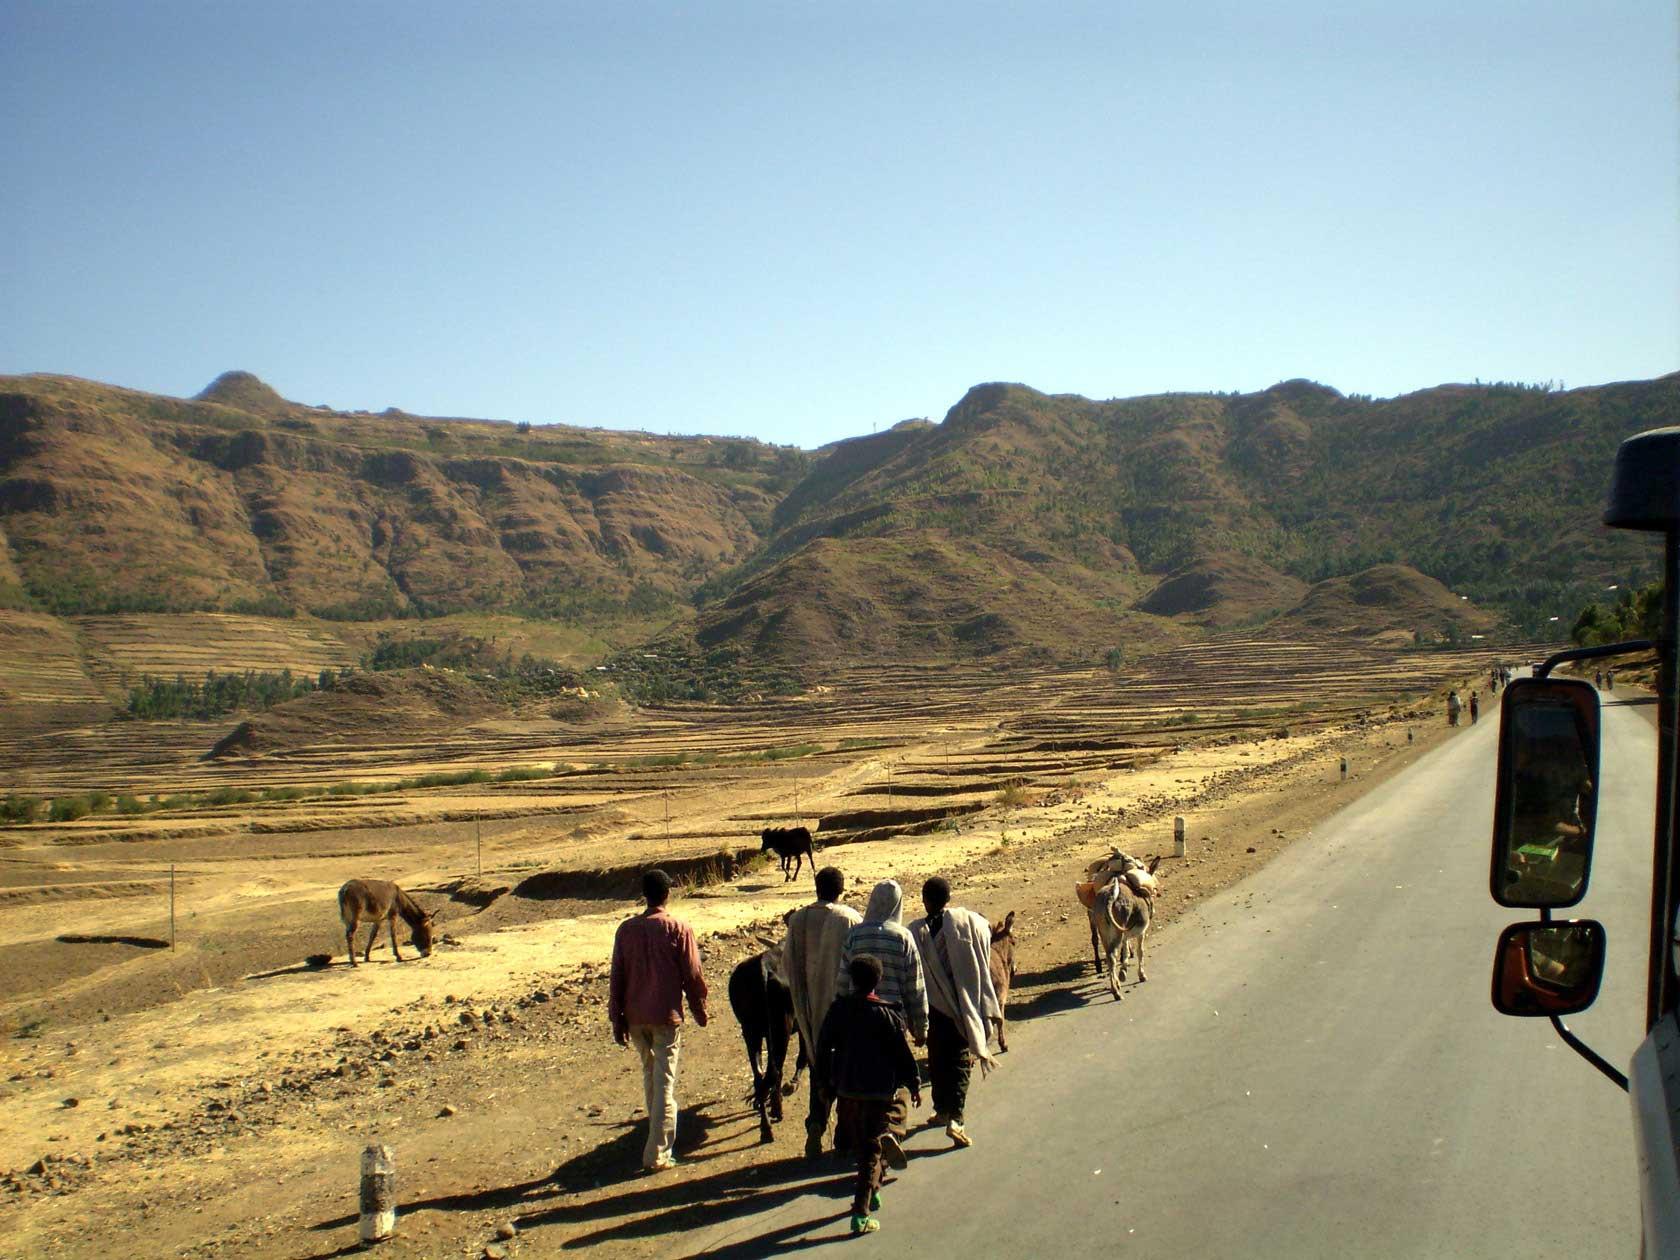 Reizen - Onderweg in Ethiopië